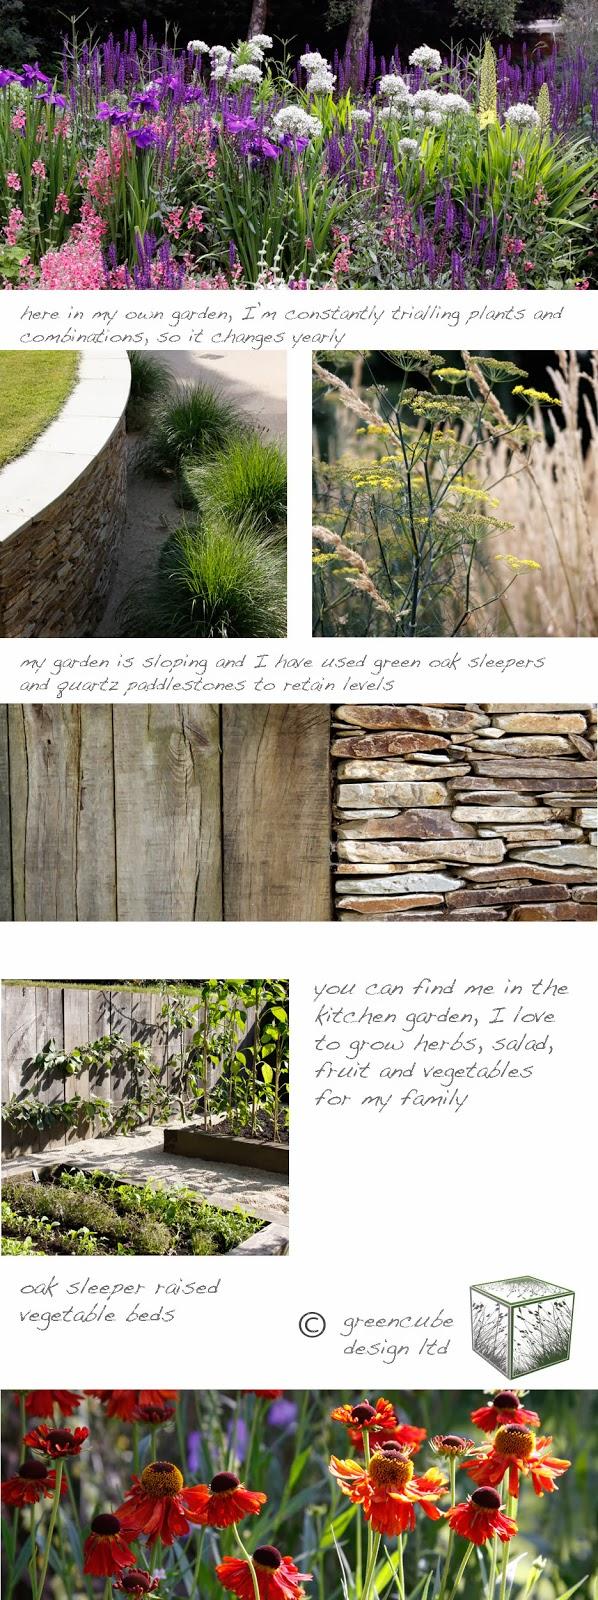 Greencube Garden And Landscape Design, UK: Greencube's